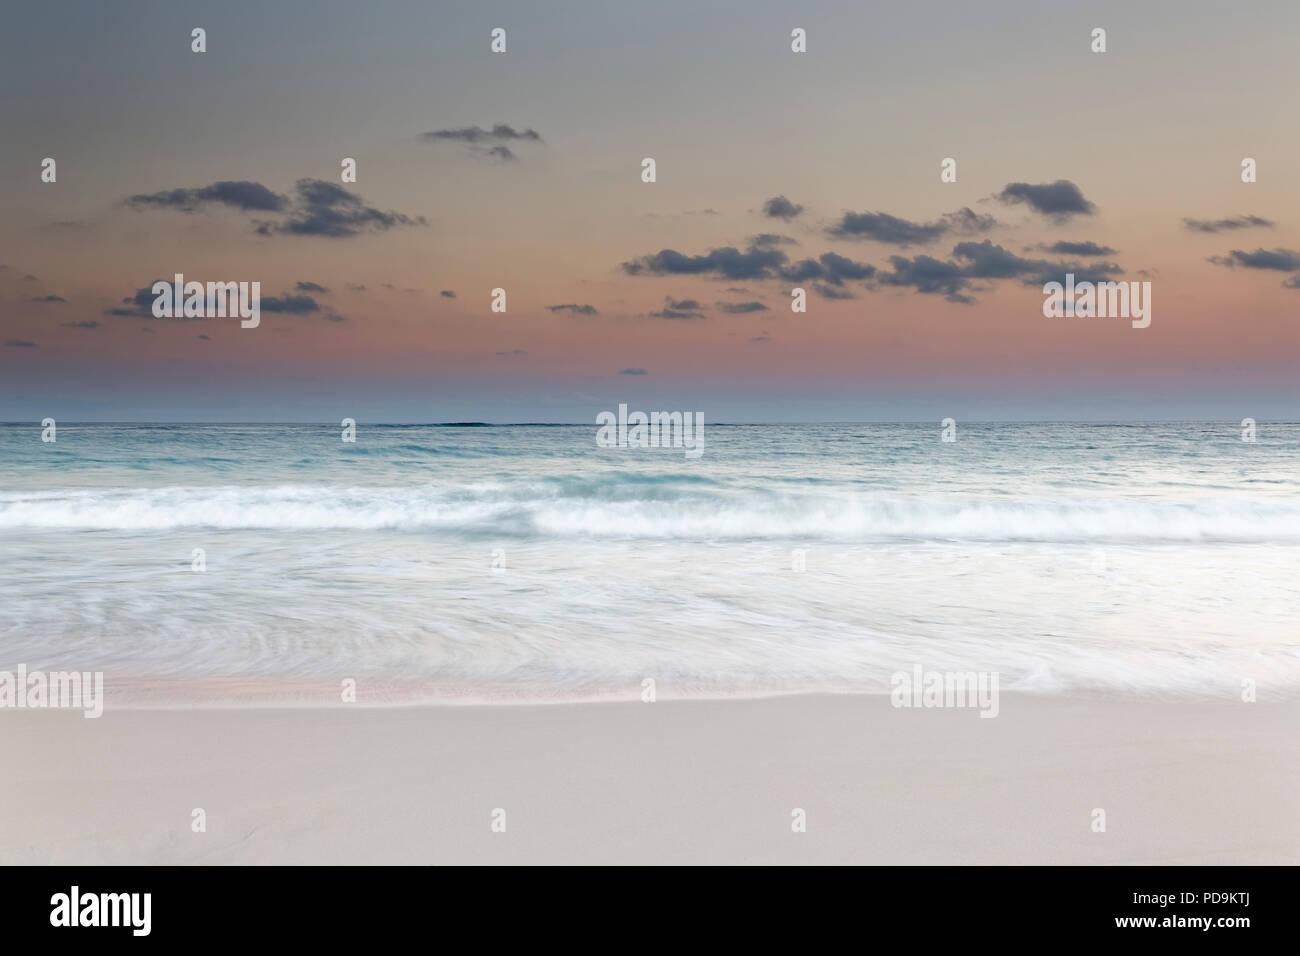 Surf during dusk over the sea, Playa Bavaro, Punta Cana, Dominican Republic - Stock Image